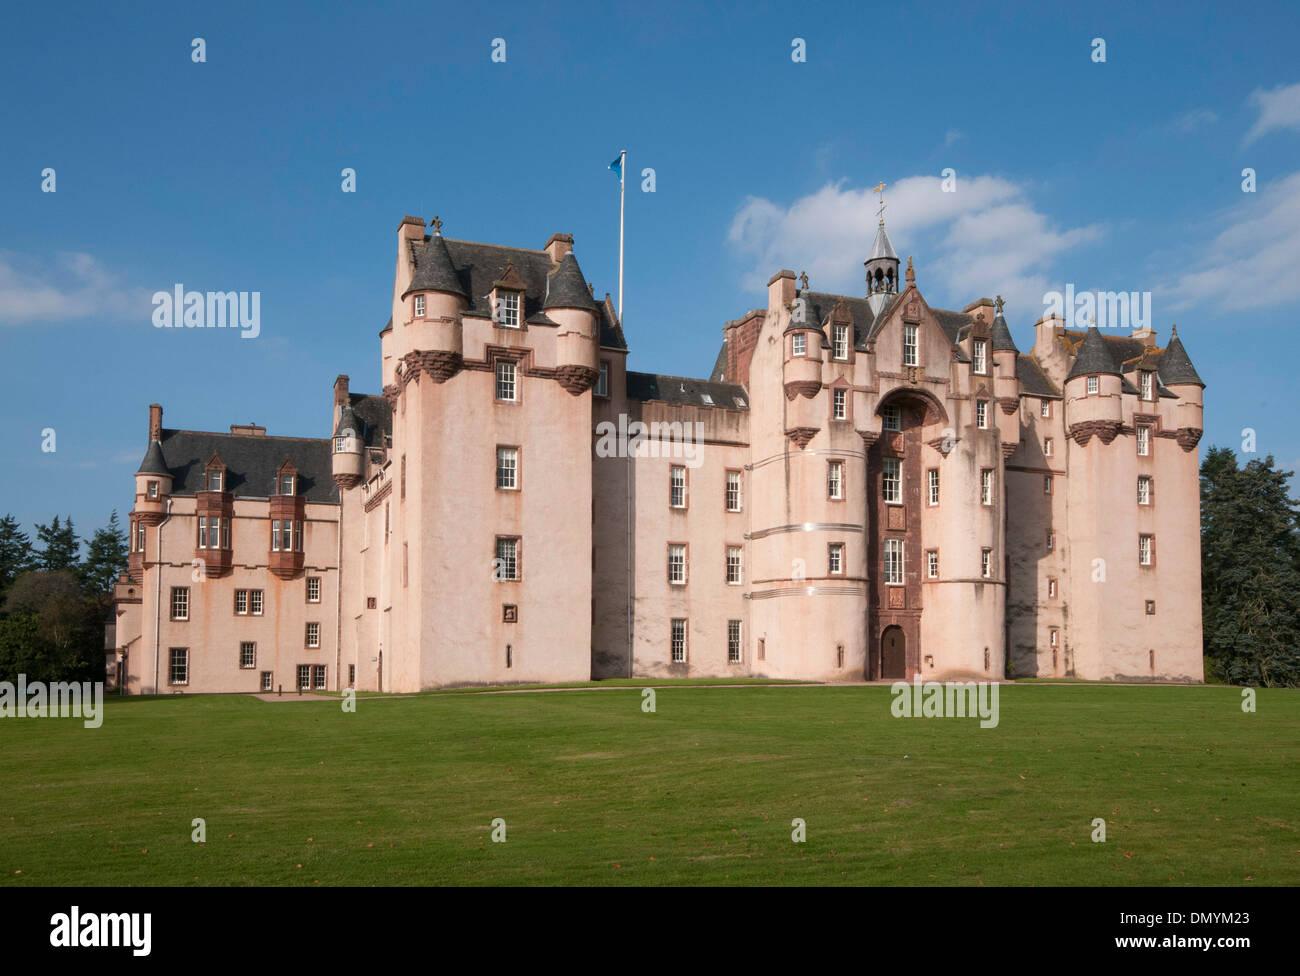 national trust for scotland fyvie castle in pink near turrif - Stock Image